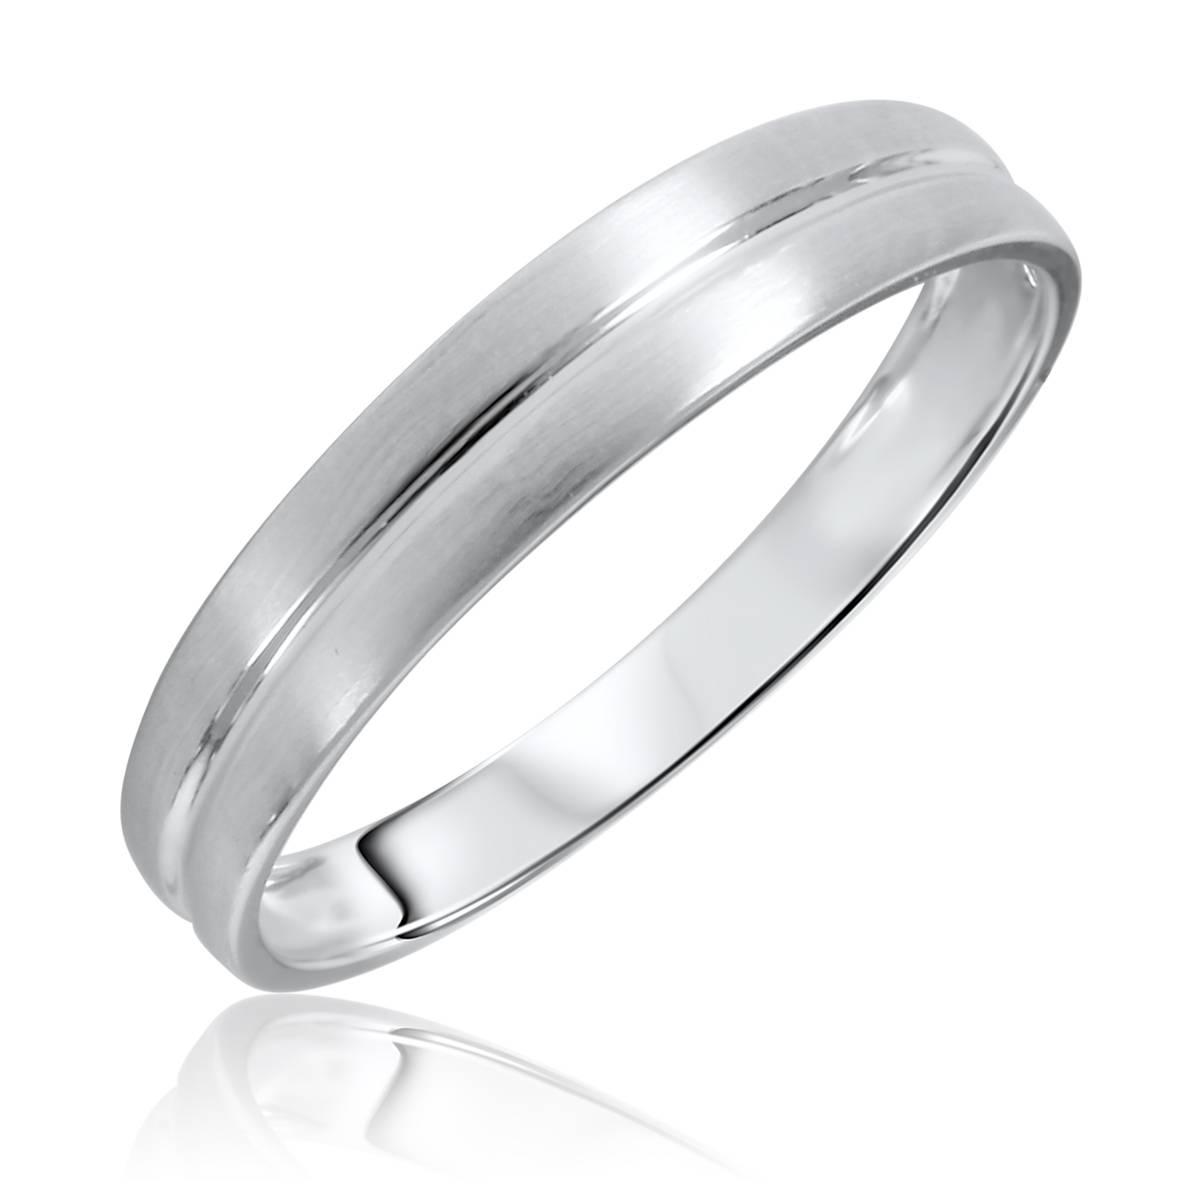 Wedding Rings : White Gold Wedding Ring Men Discount Wedding Rings Throughout White Gold Wedding Bands For Men (View 6 of 15)